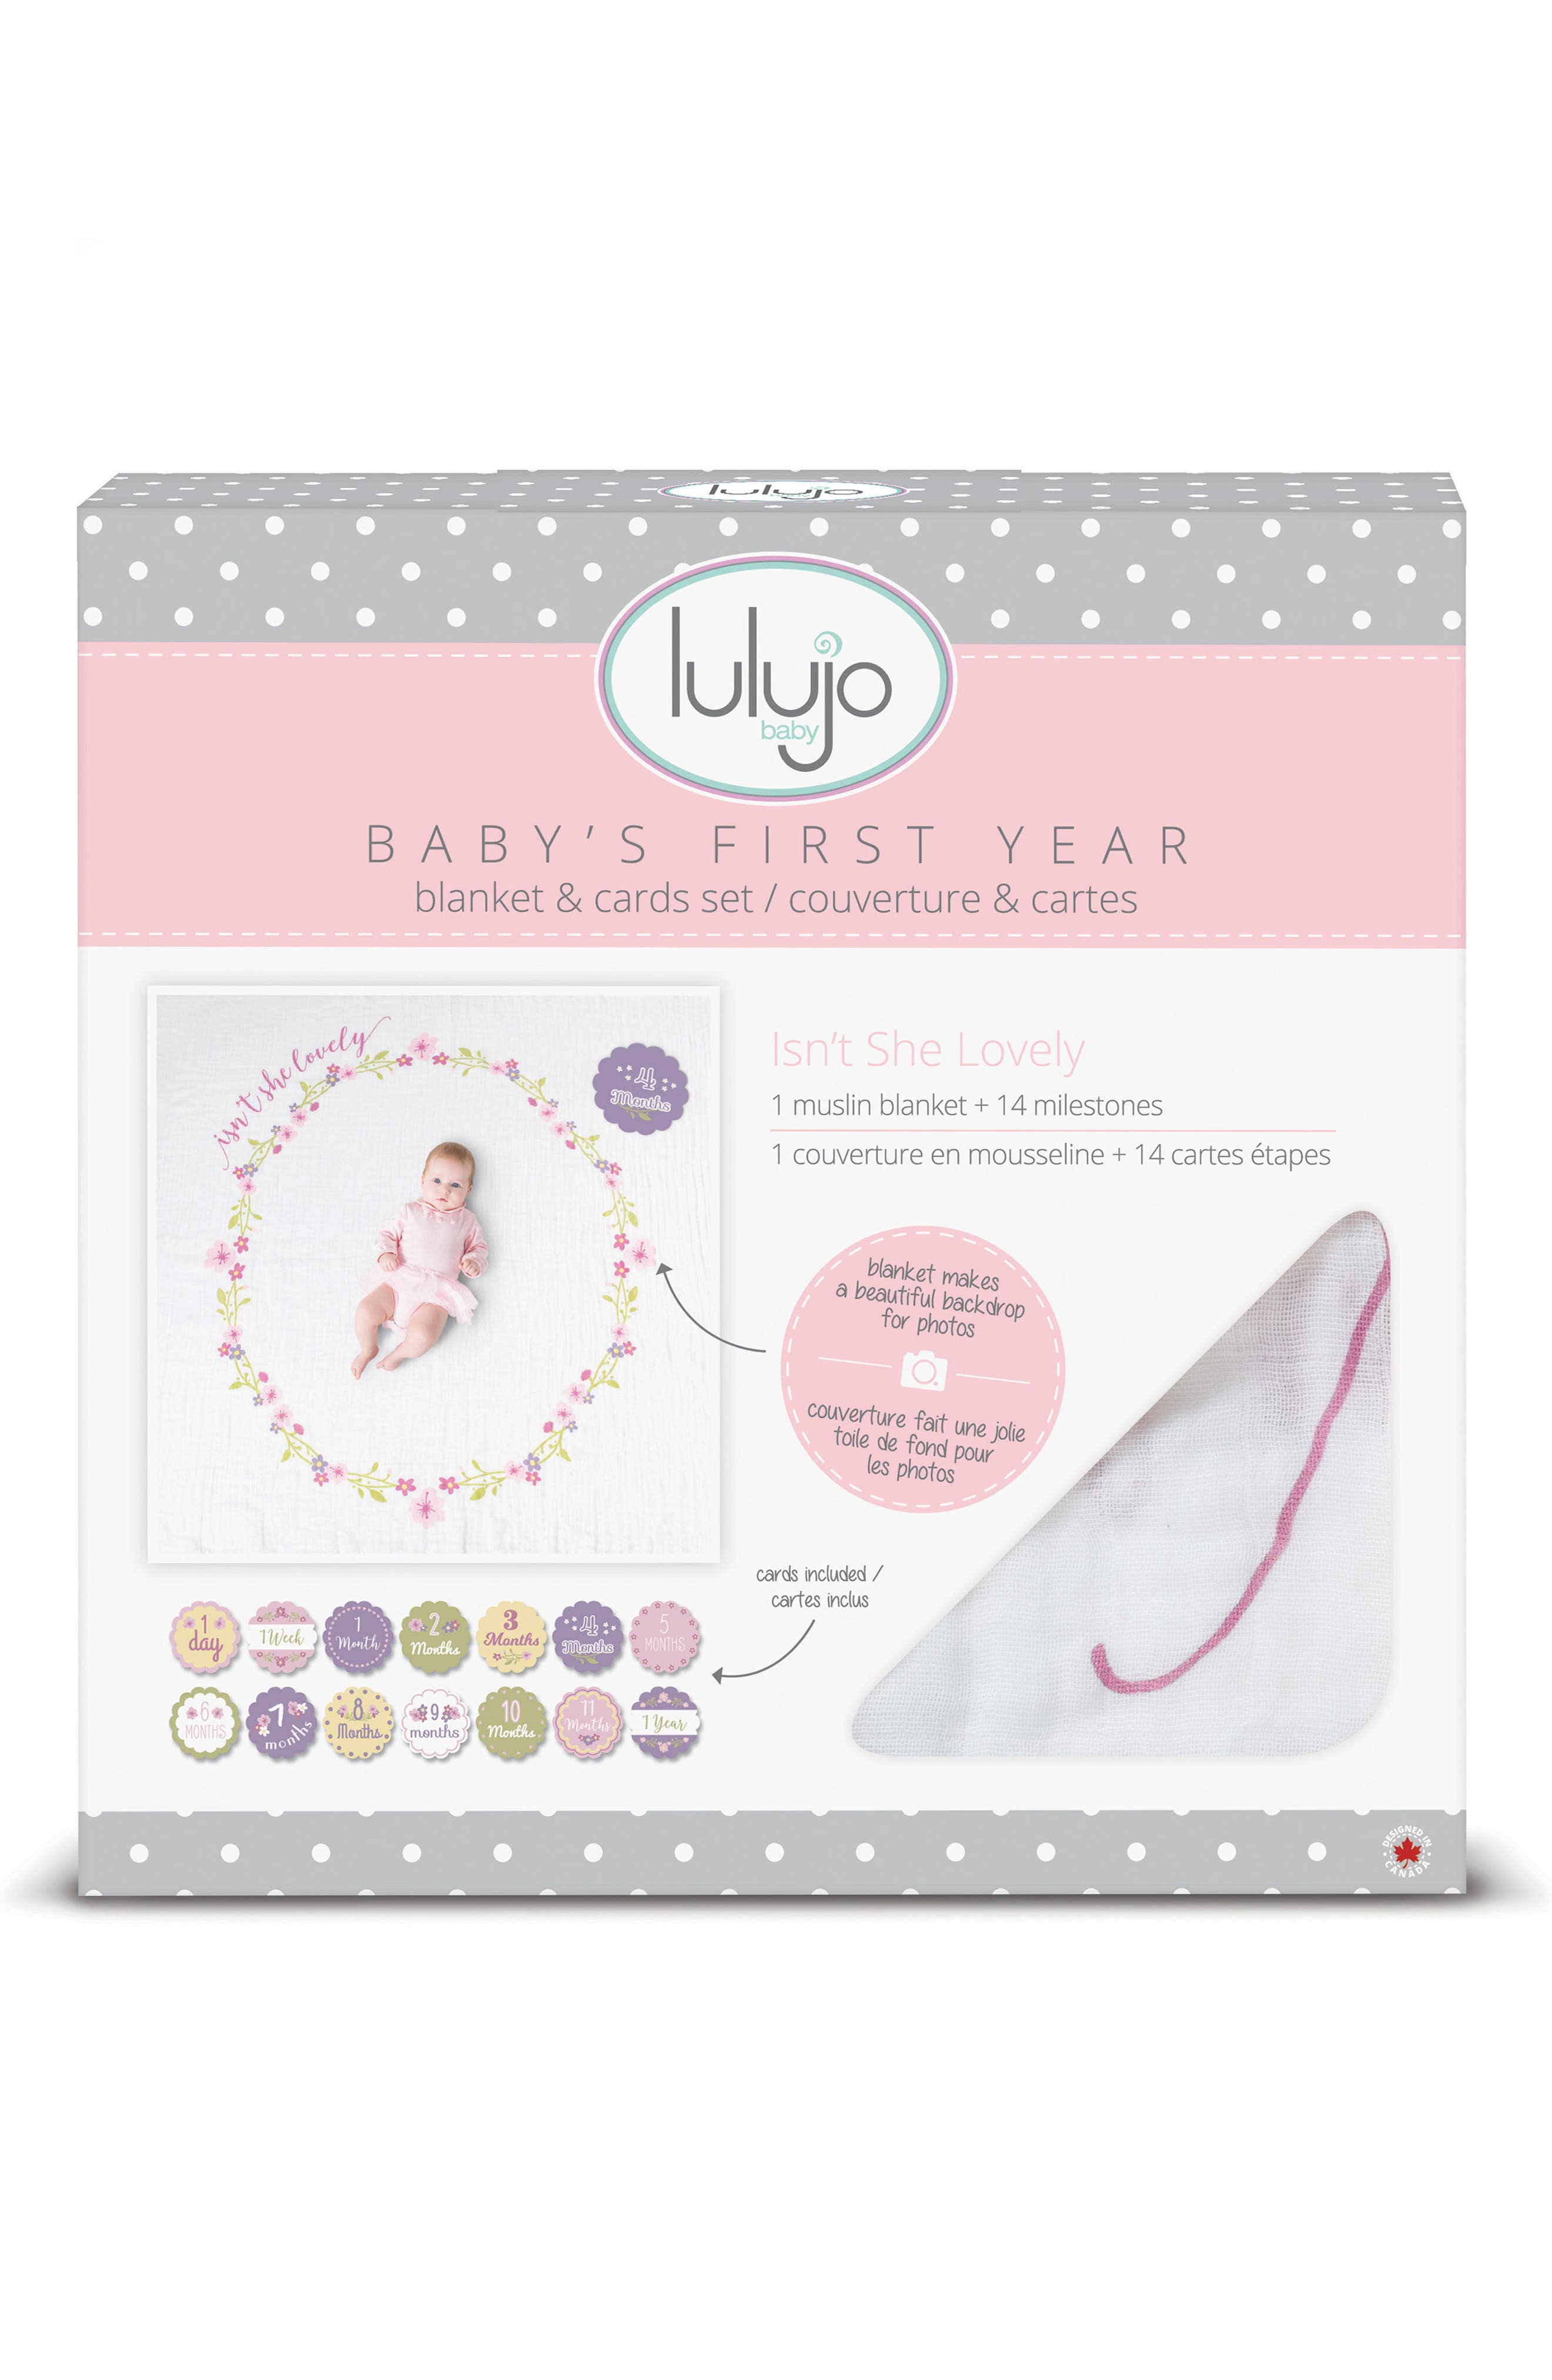 LULUJO, Baby's First Year - Isn't She Lovely Muslin Blanket & Milestone Card Set, Alternate thumbnail 2, color, ISNT SHE LOVEY